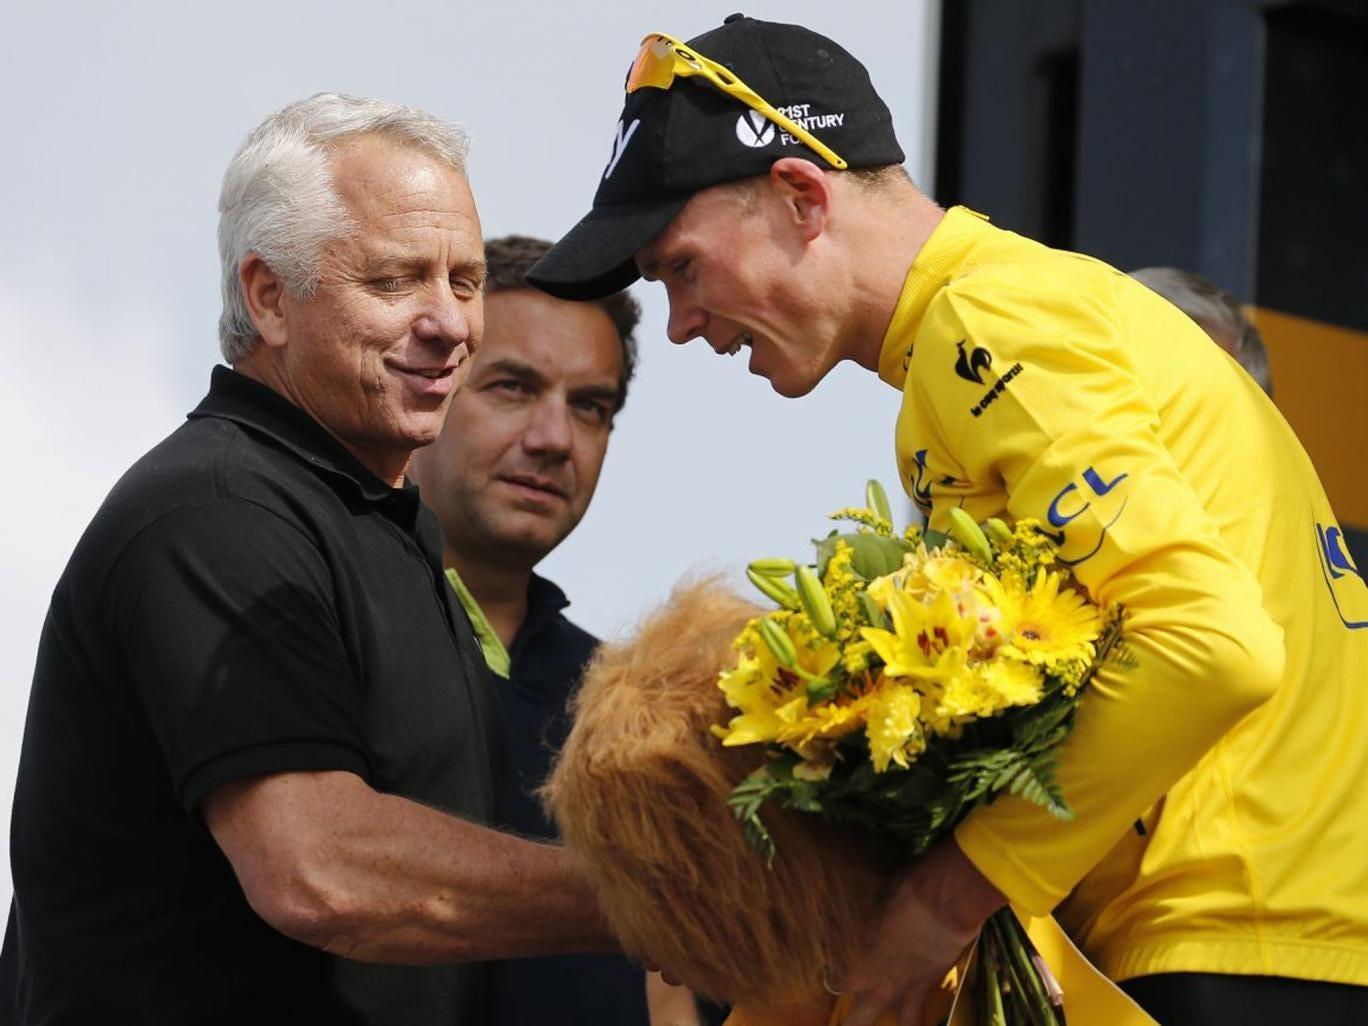 Yellow fellows: Former Tour hero Greg LeMond greets Chris Froome